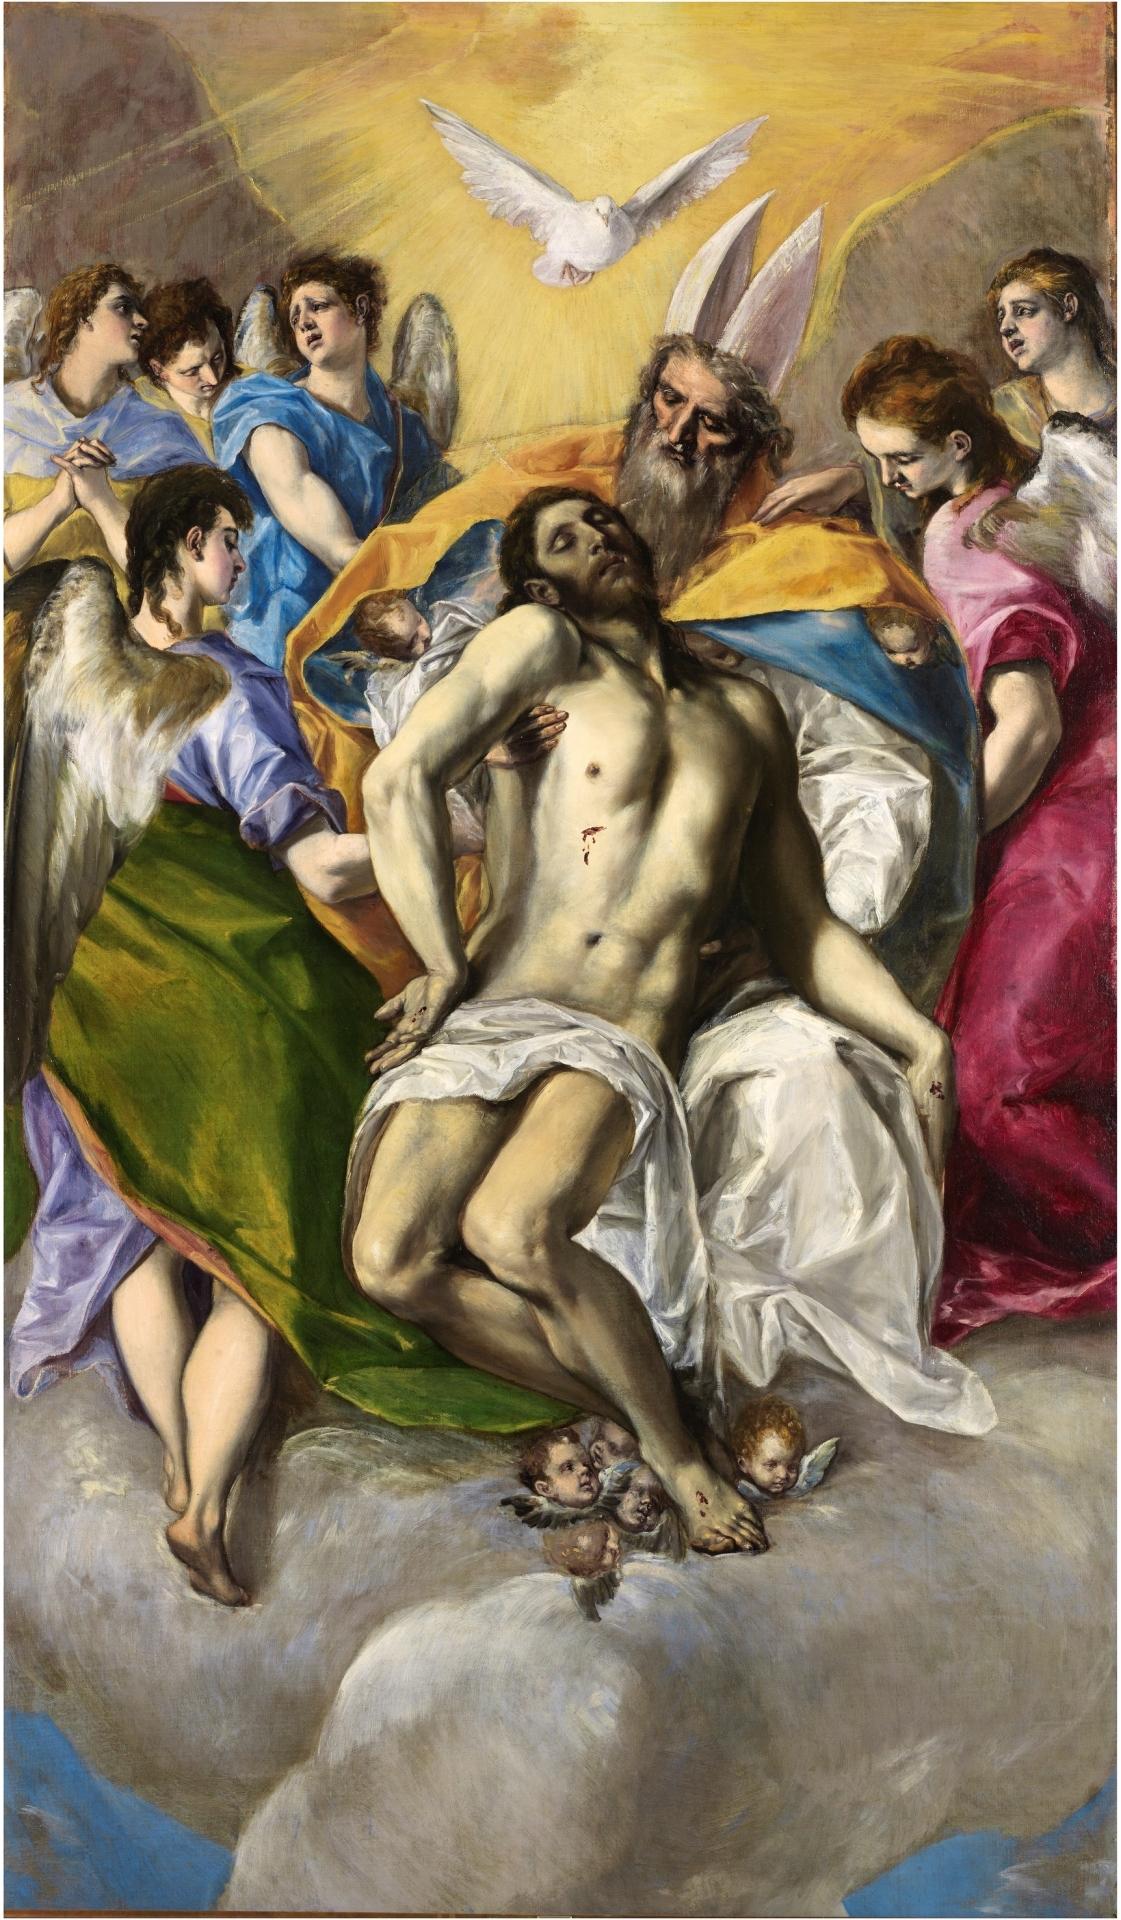 The Holy Trinity - The Collection - Museo Nacional del Prado